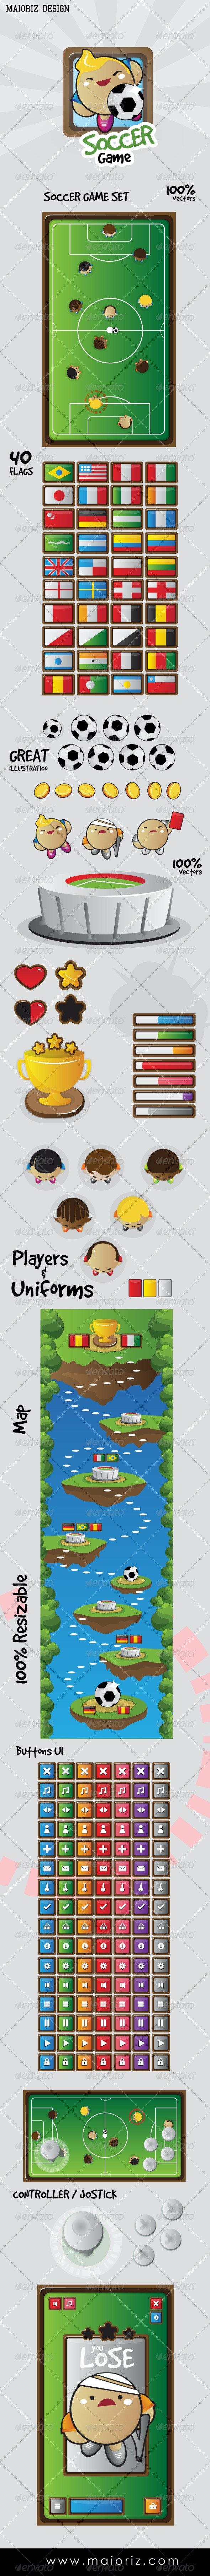 Soccer Game Set UI - Miscellaneous Vectors